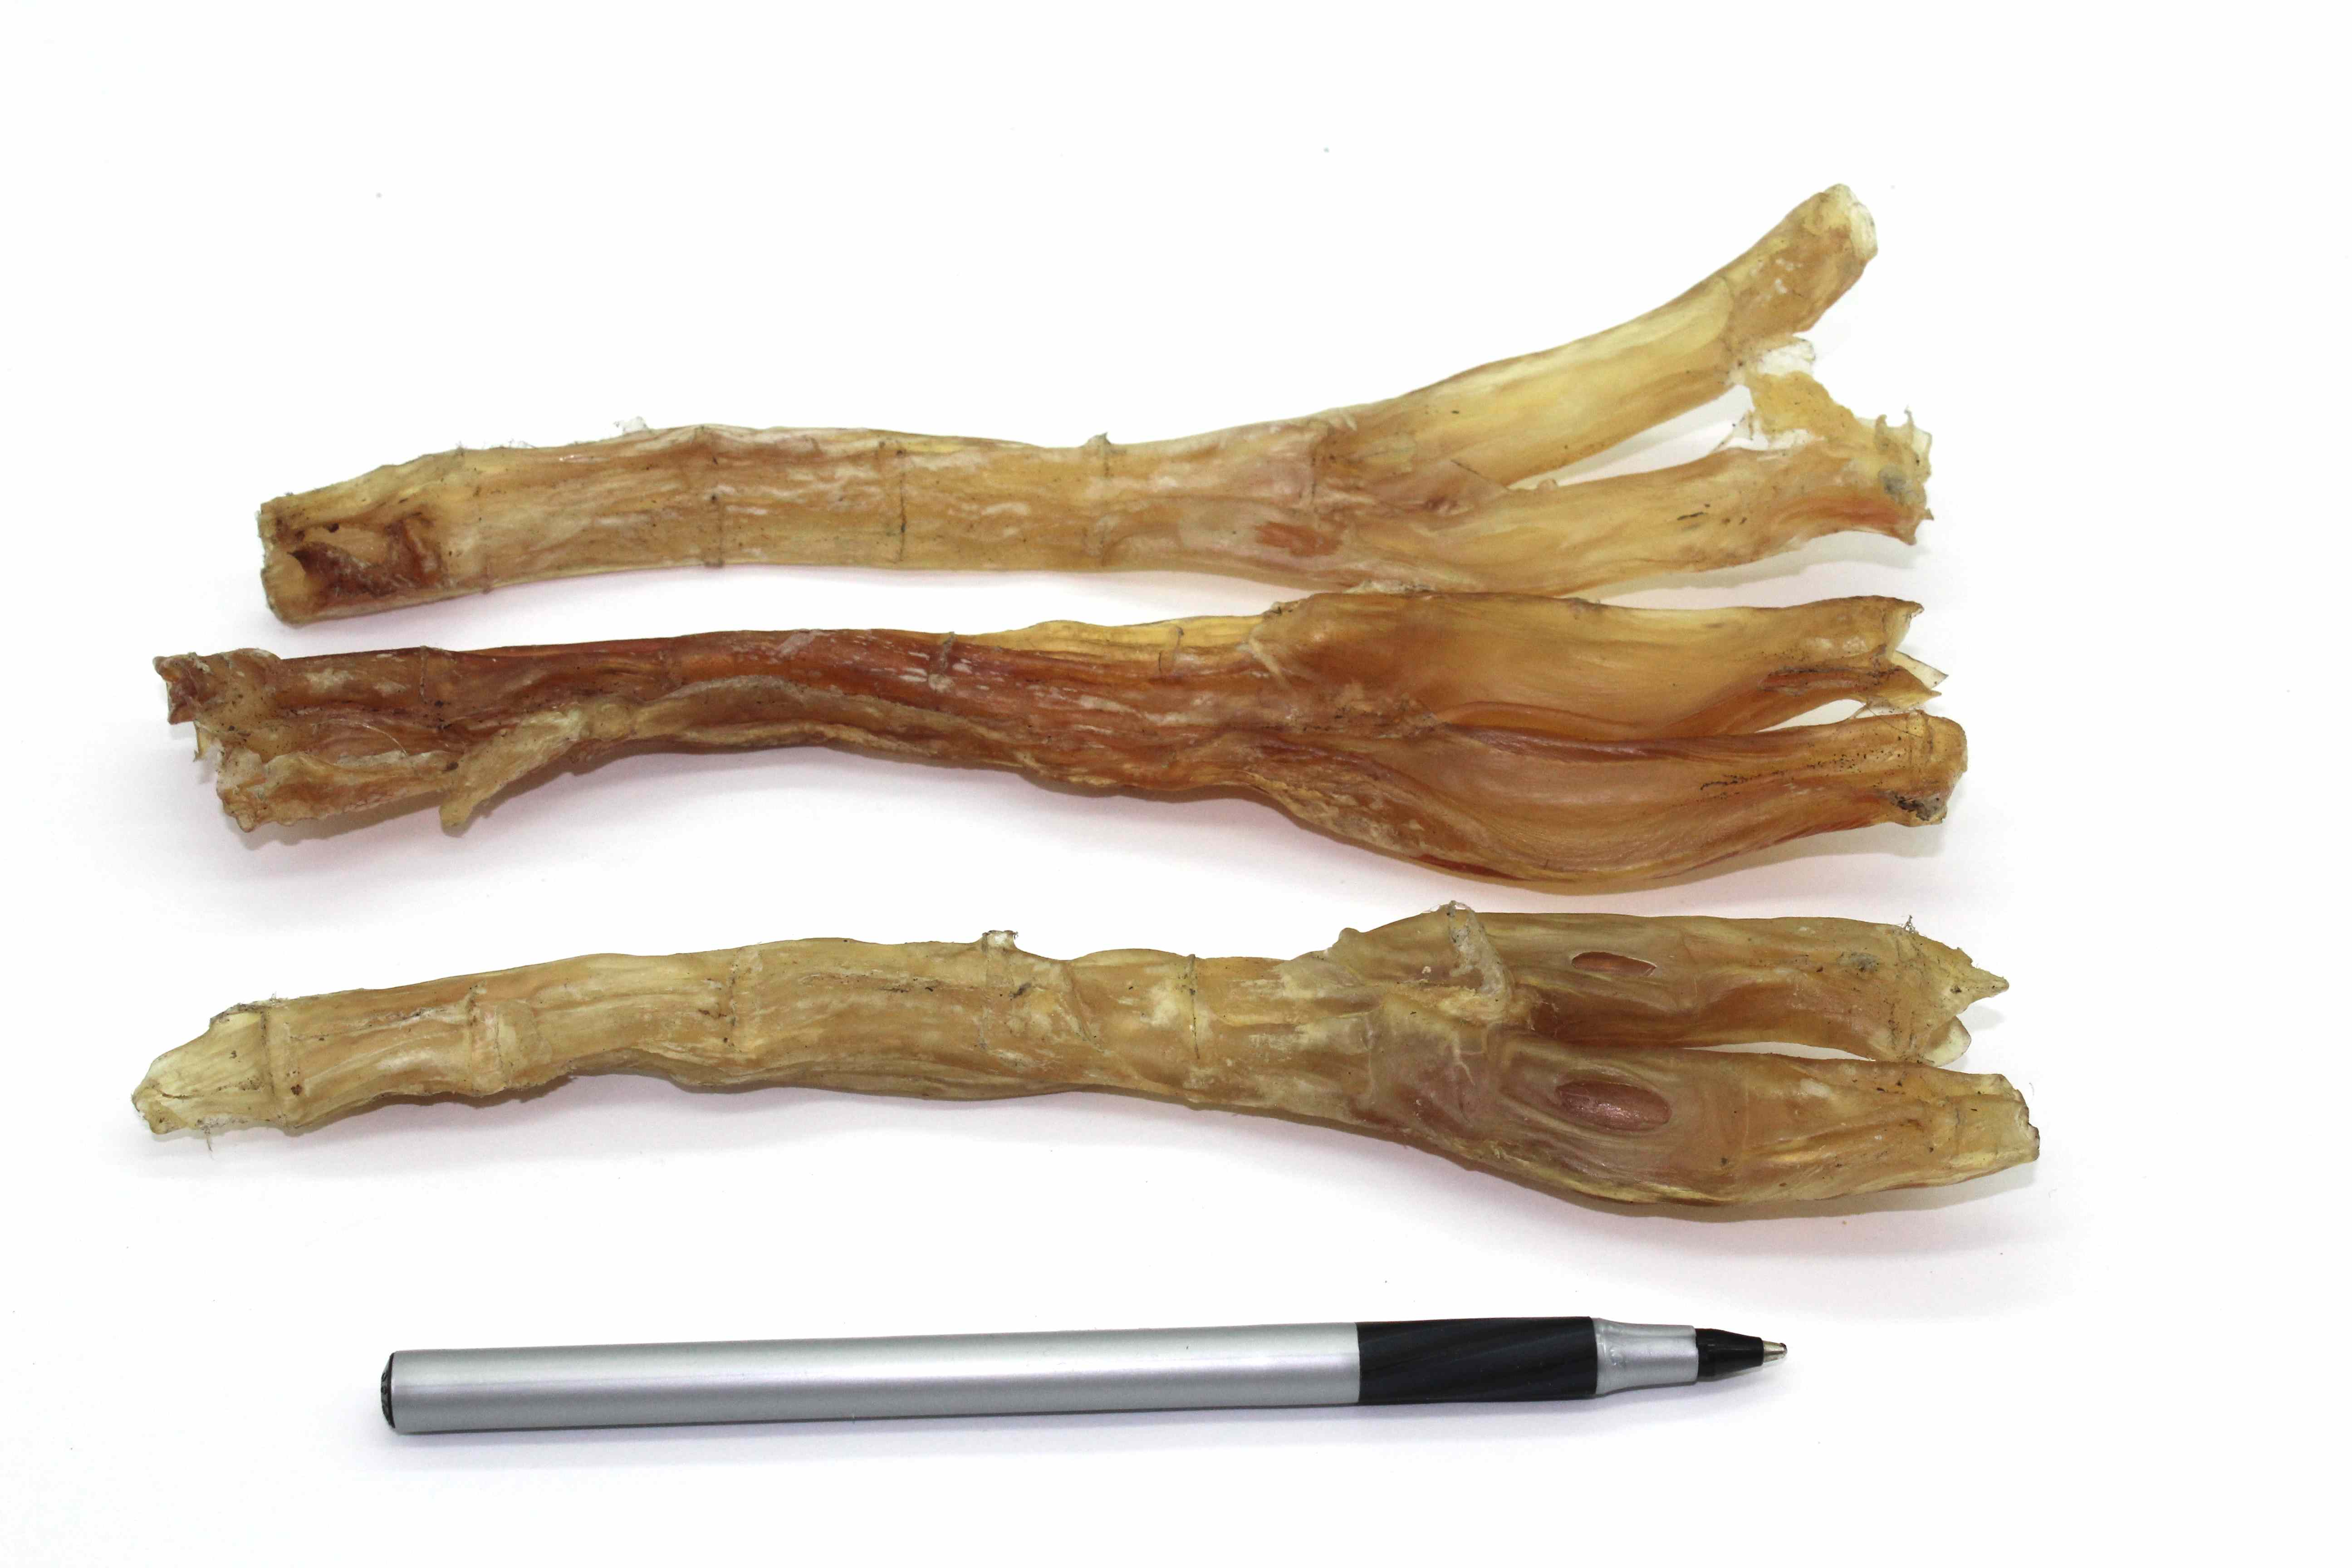 buffalo tendon dental chew 50 6 9 long each. Black Bedroom Furniture Sets. Home Design Ideas